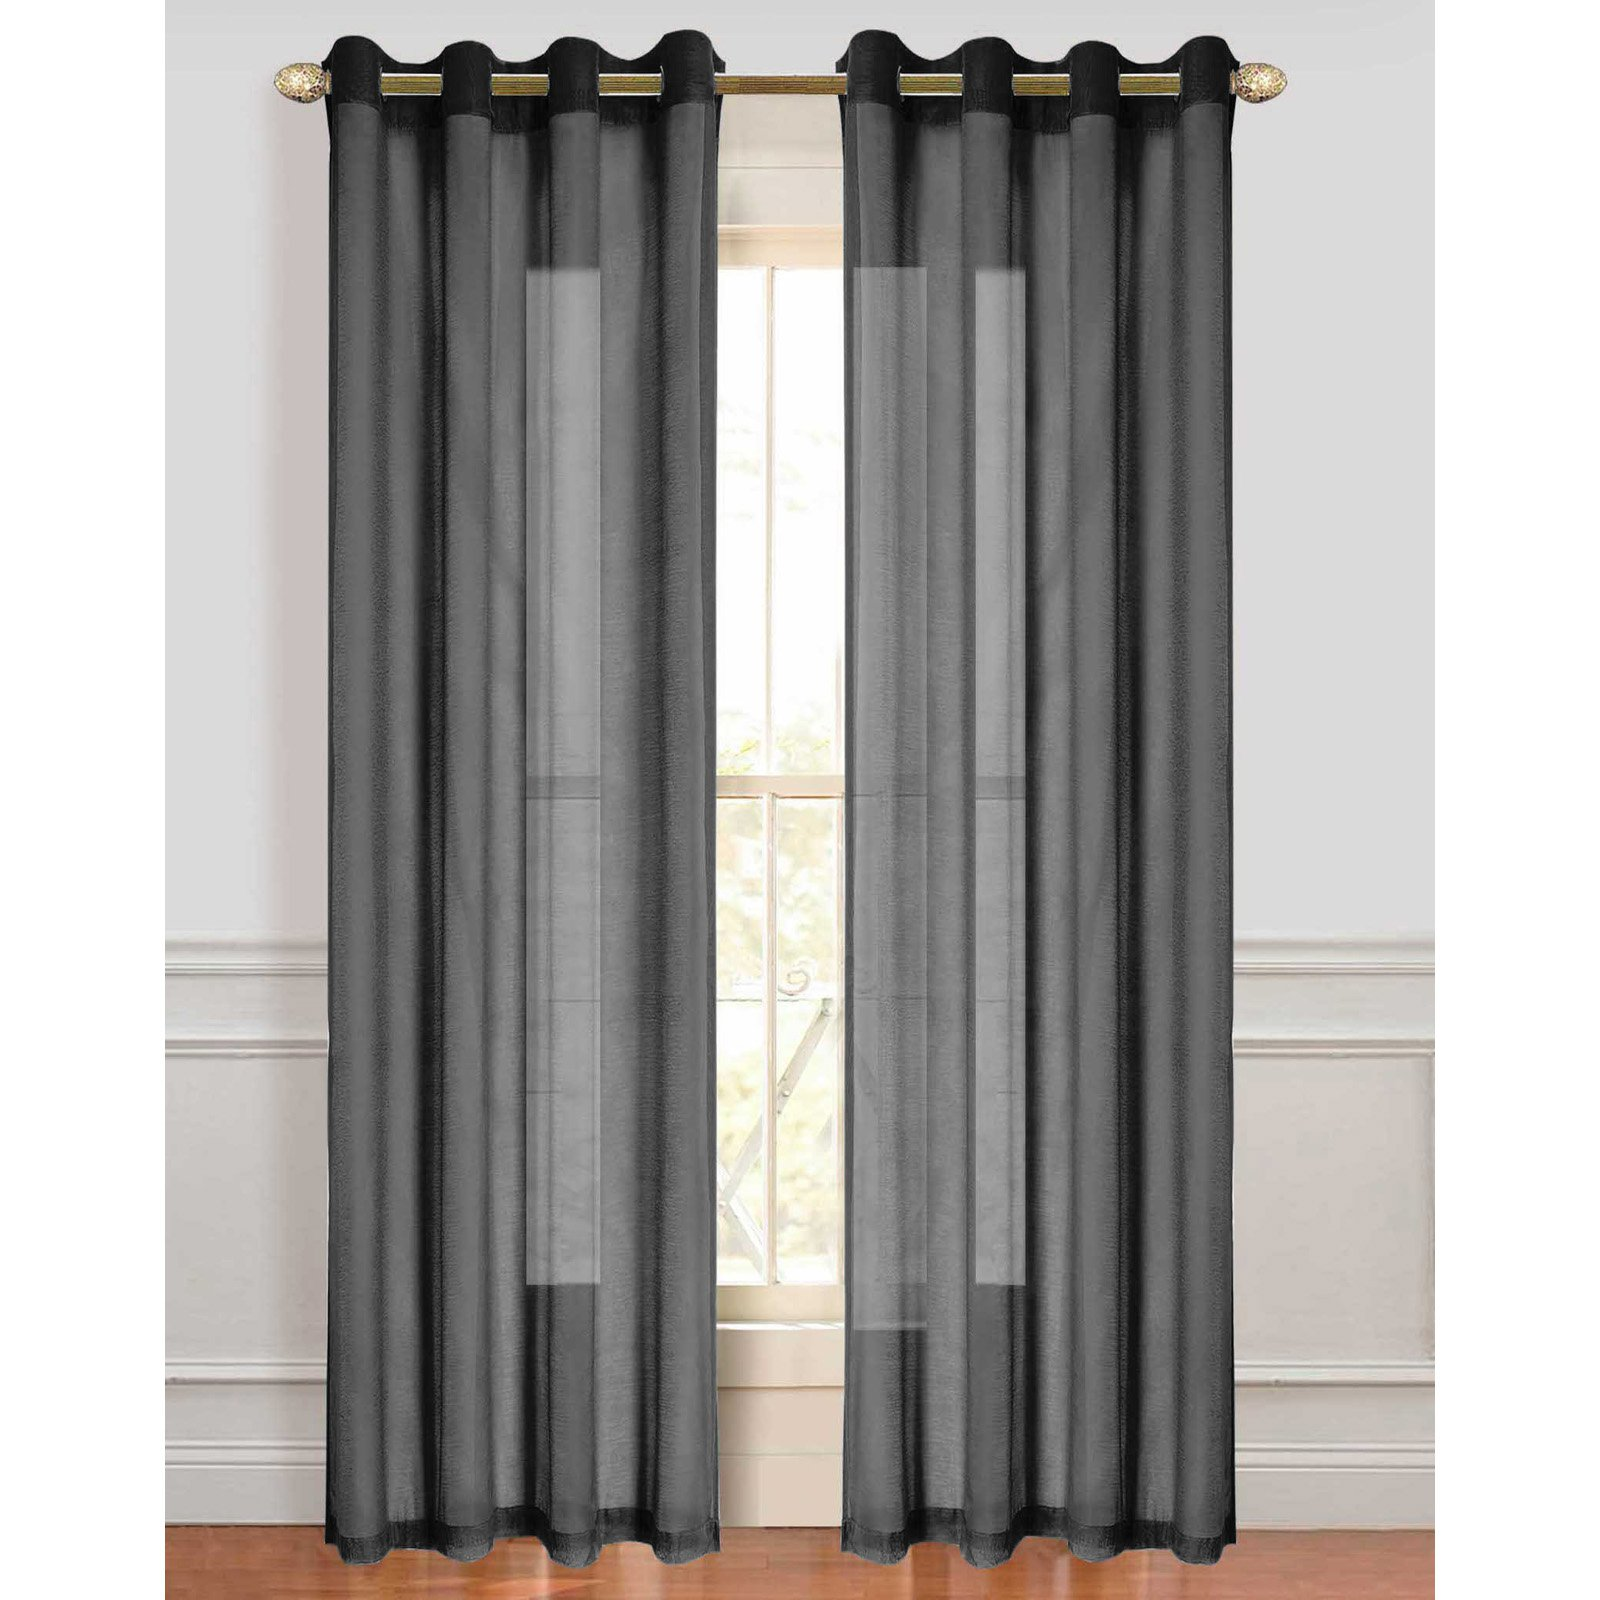 dainty home malibu window curtain panel set of 2 84 x 110 black walmart com